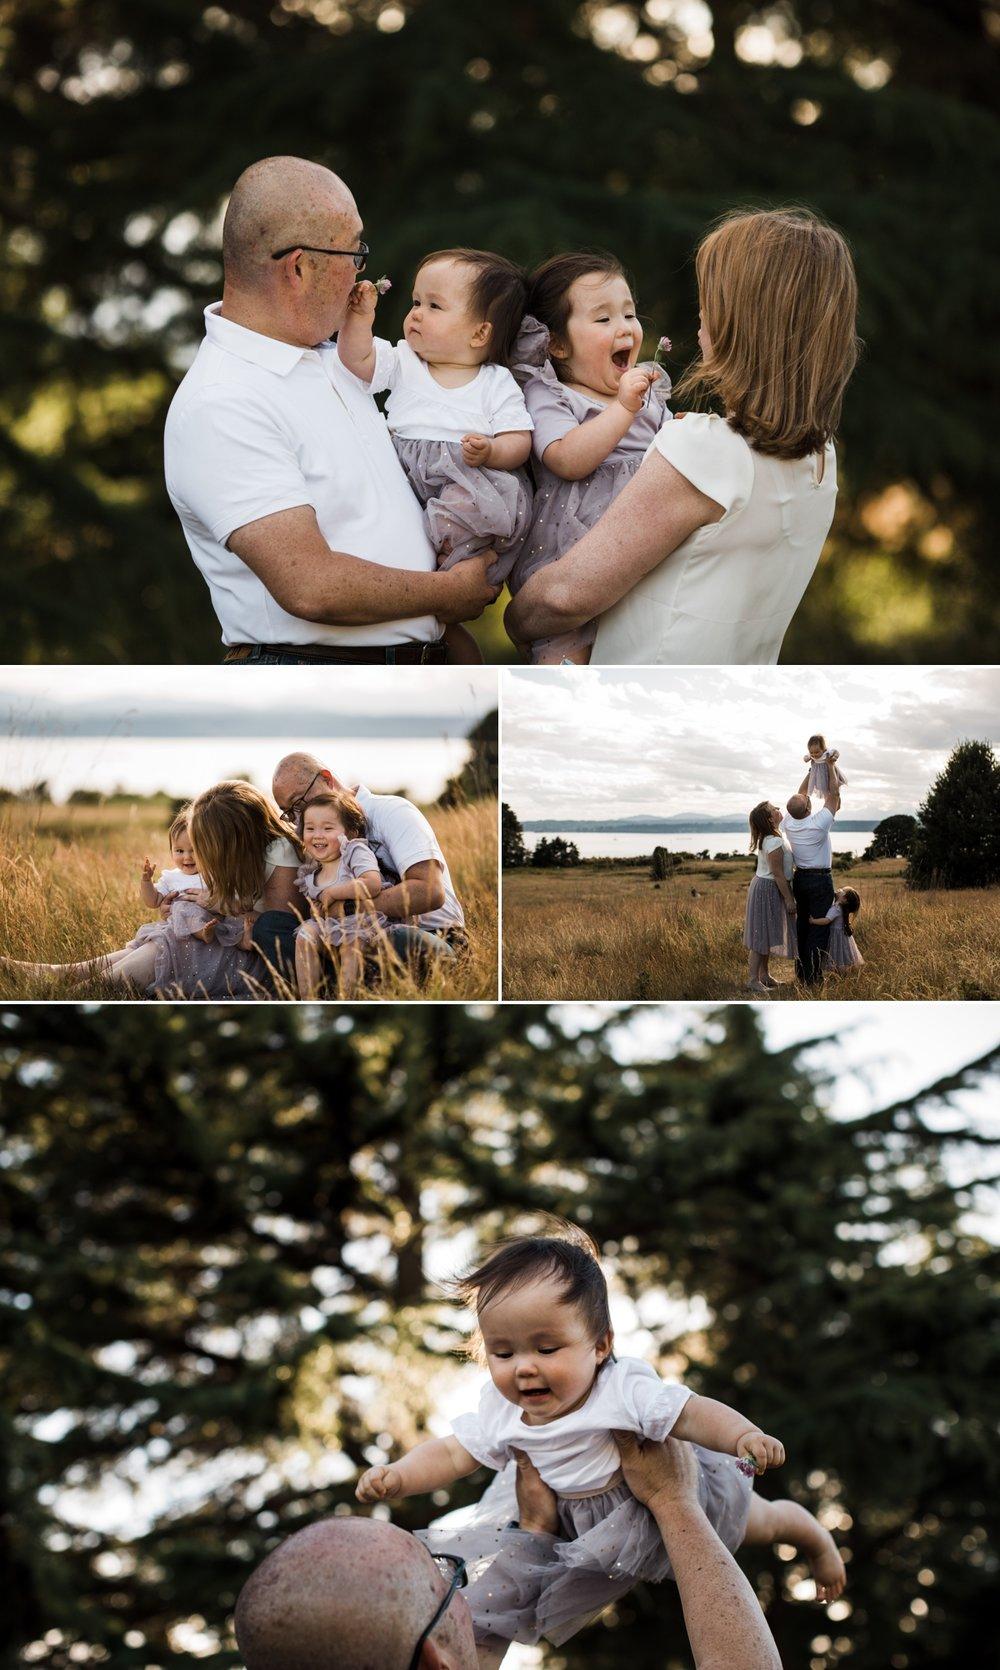 elena s blair photography seattle family photographer outdoors 9.jpg